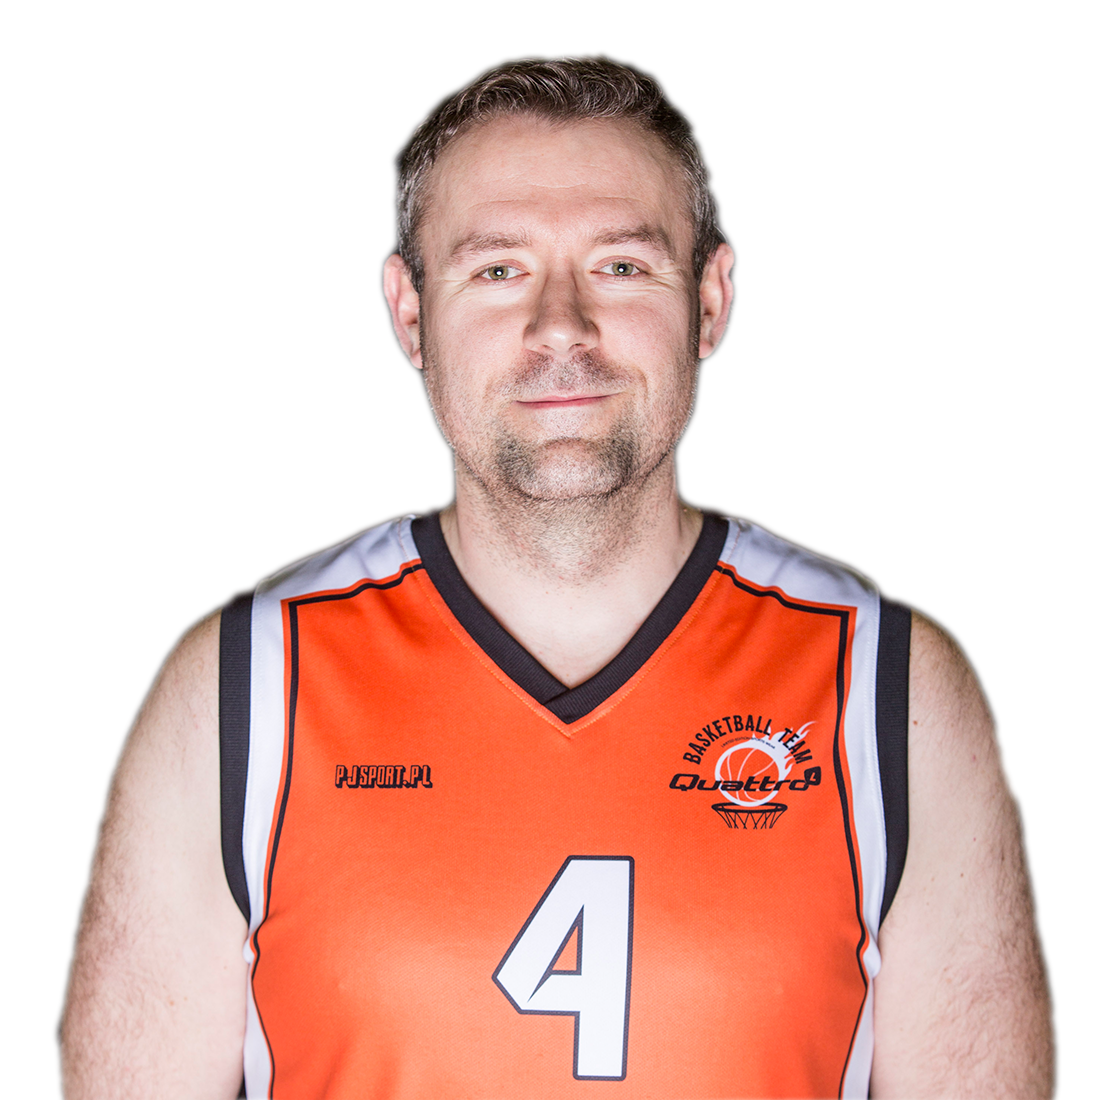 Marek Kasprzyk